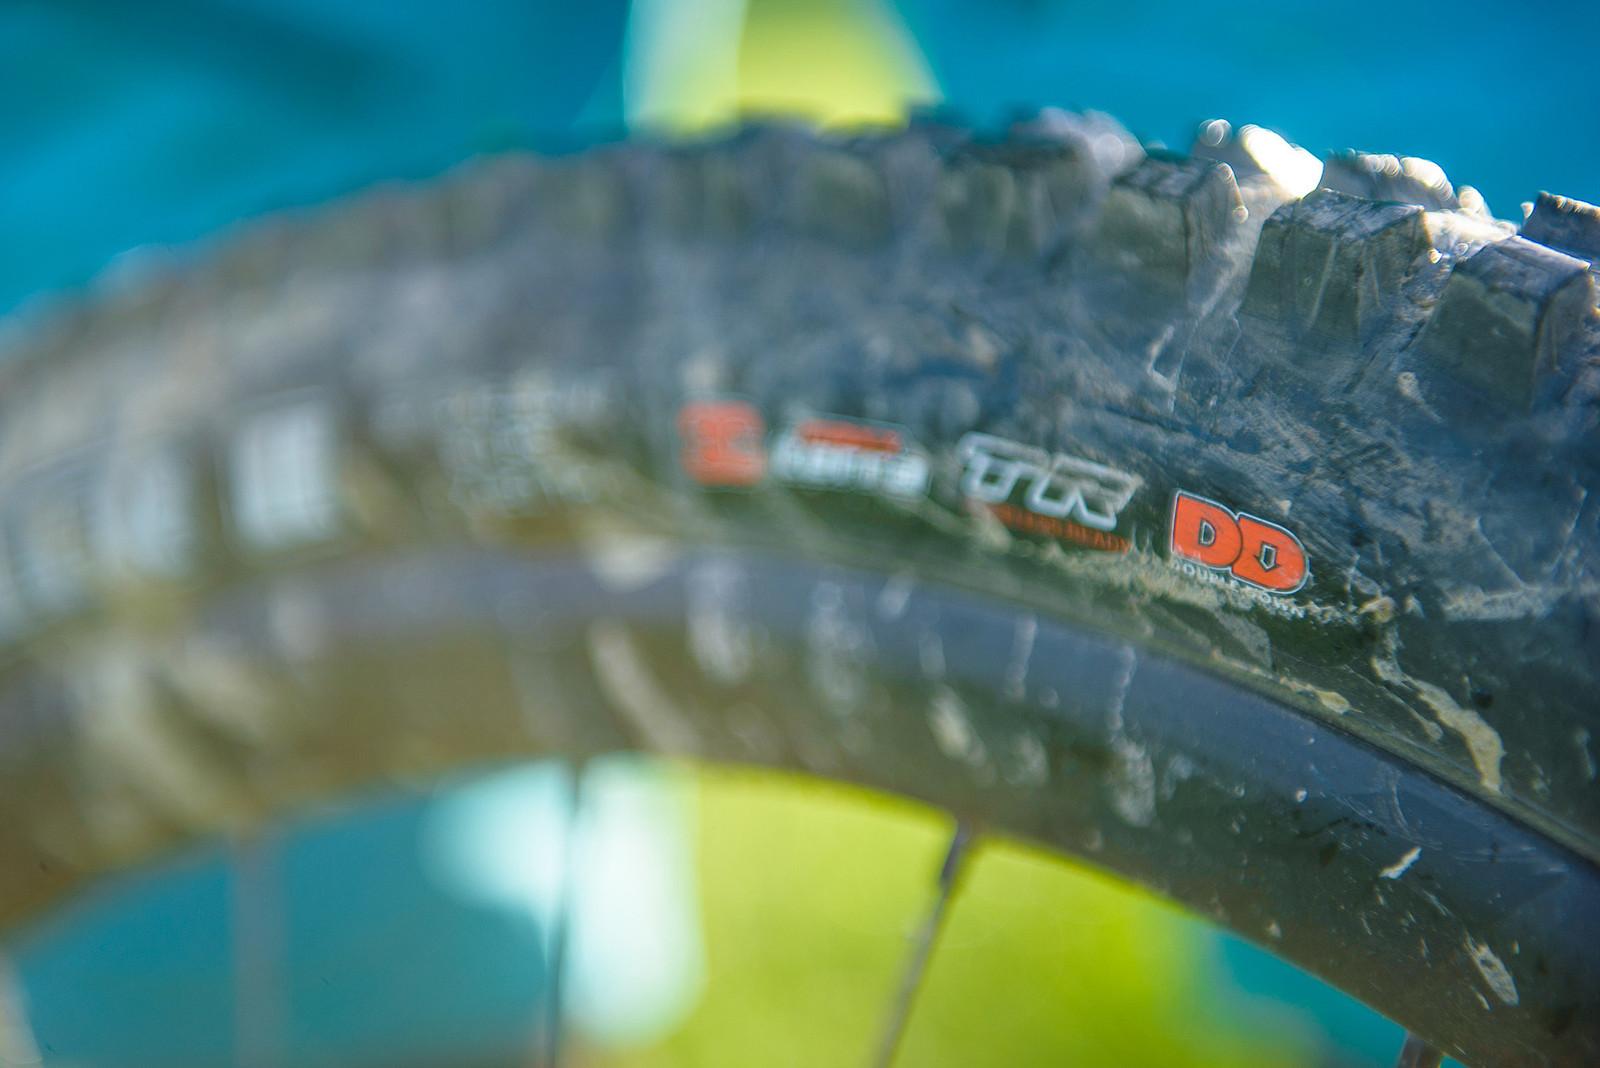 Maxxis 2.5 WT High Roller II with DoubleDown Casing - Nate Hills' Yeti SB5 with 2019 RockShox Lyrik - Mountain Biking Pictures - Vital MTB